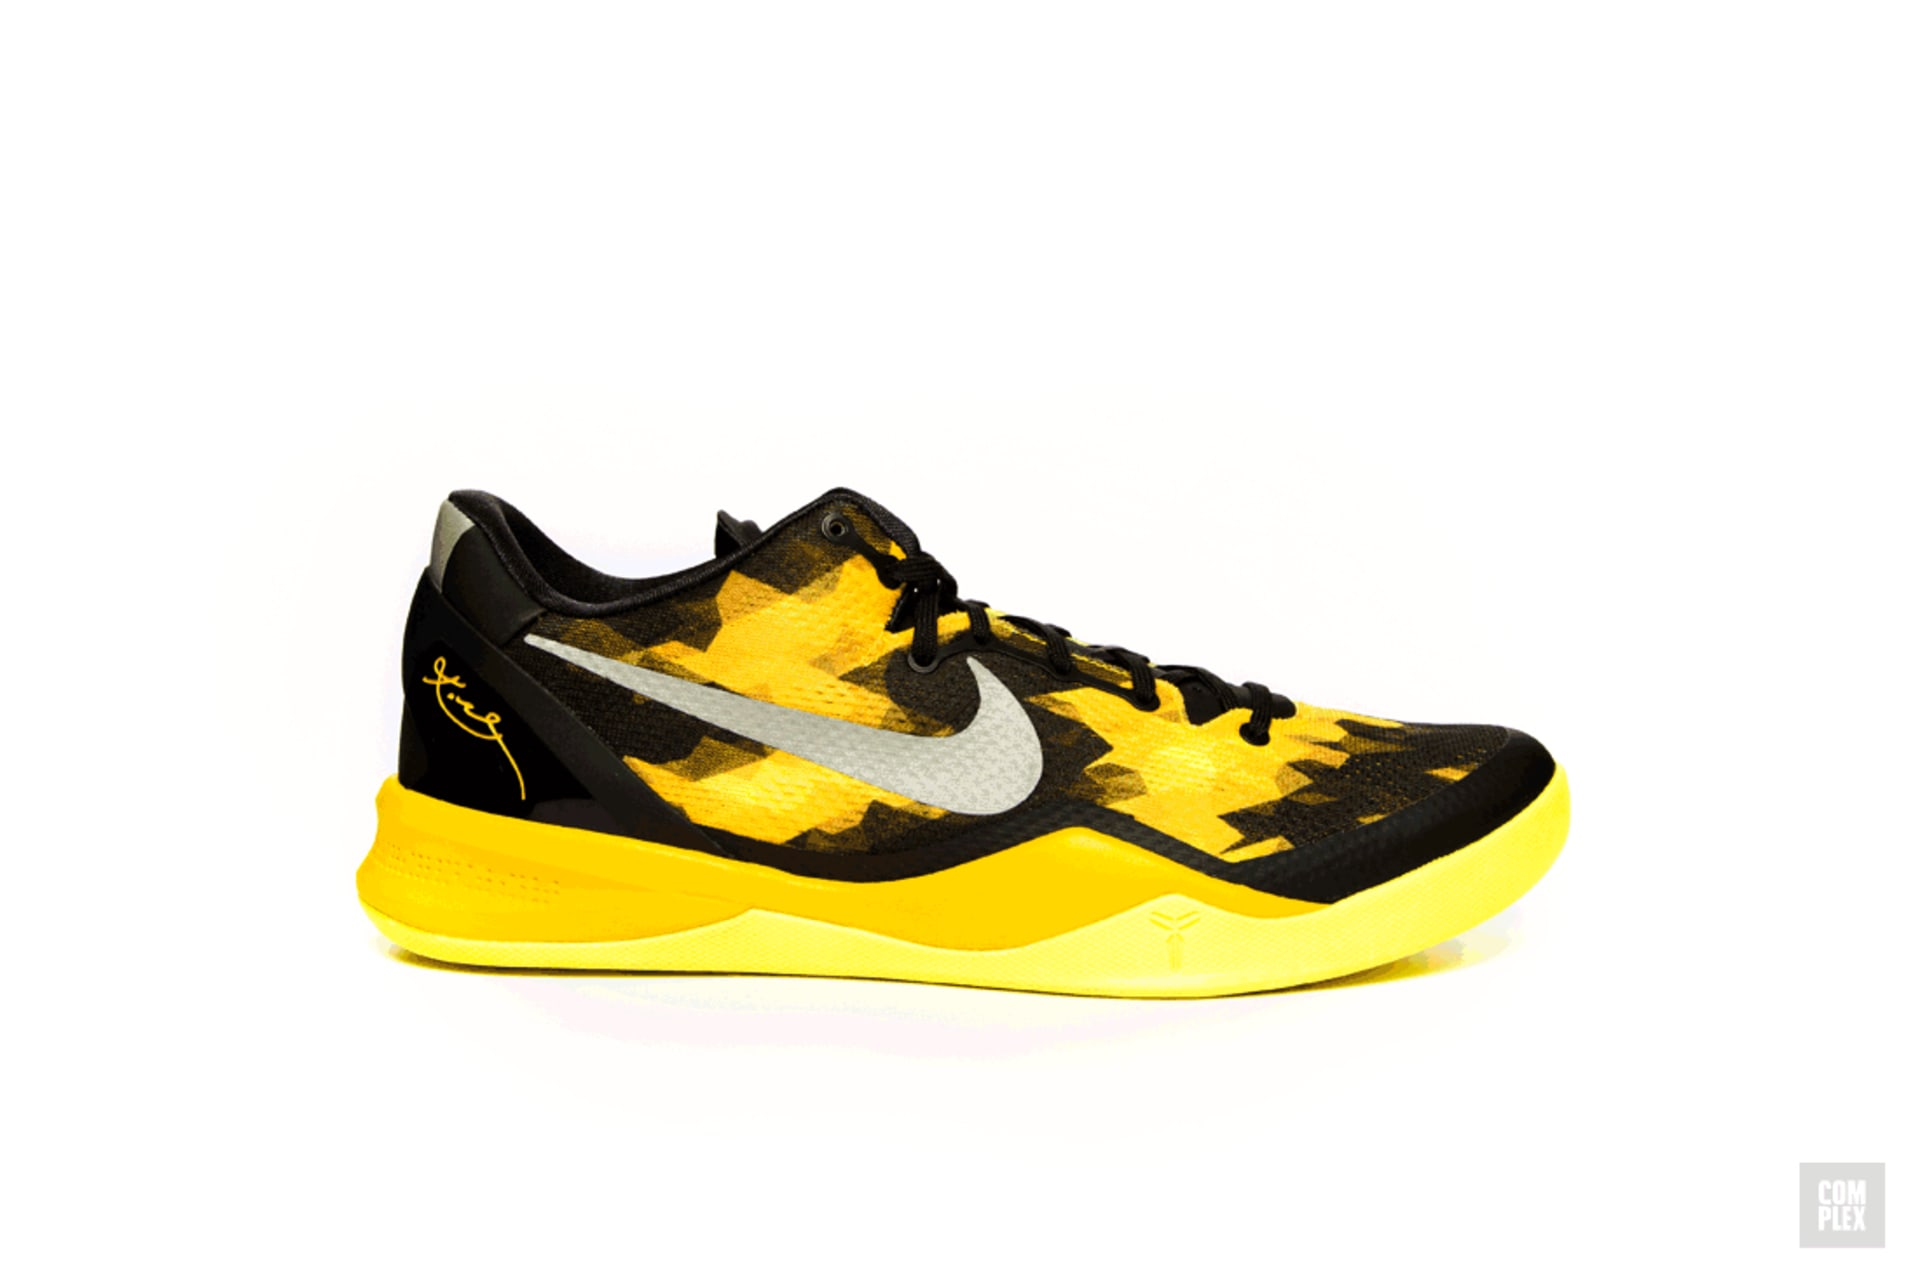 3847de3ee24 Kobe Bryant Signature Sneaker Design Evolution